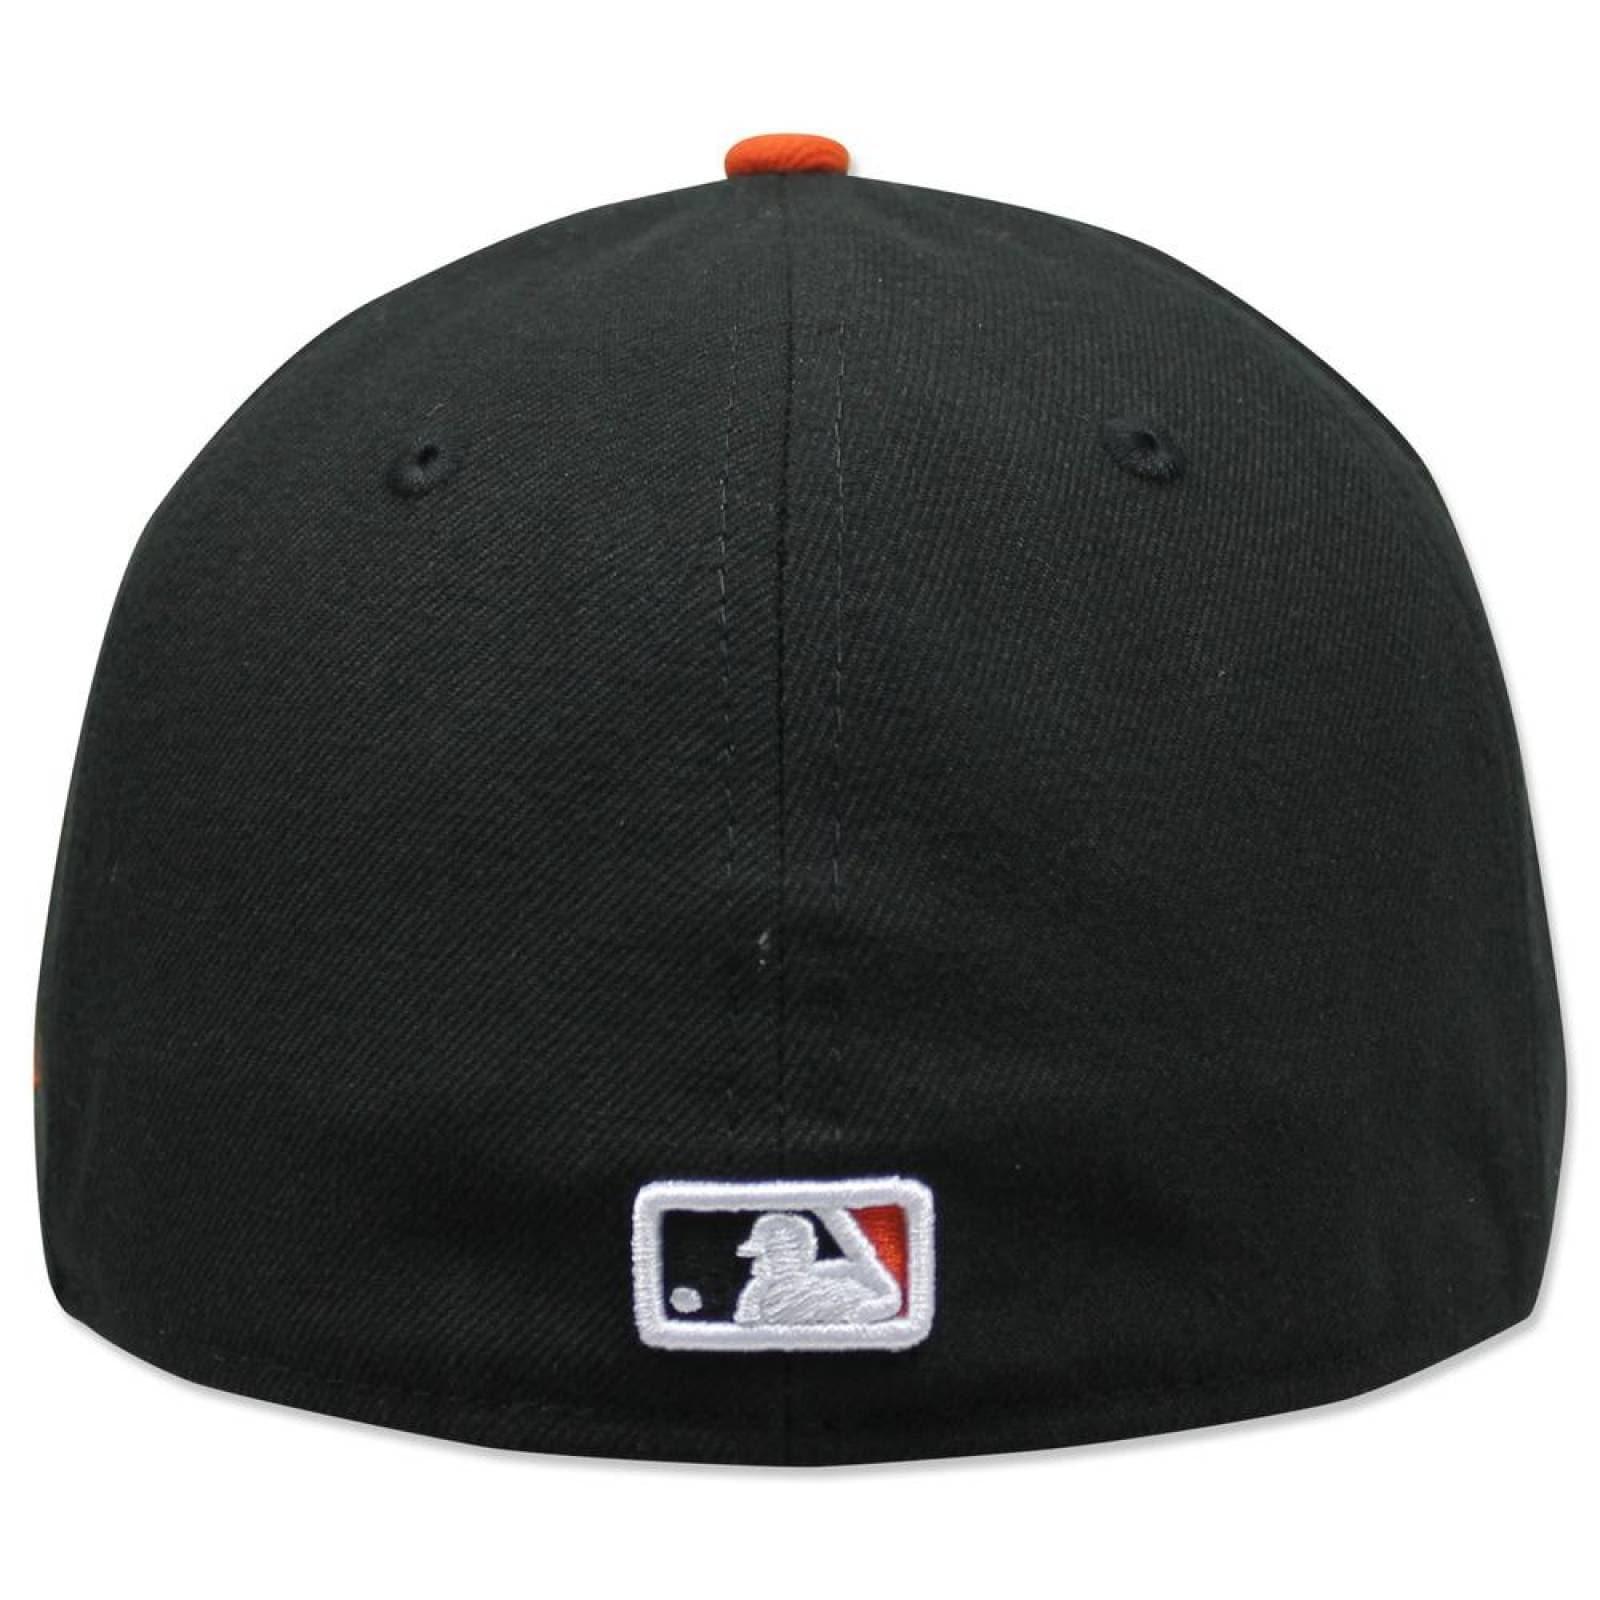 Gorra New Era 5950 MLB Giants Ac Perf Negro